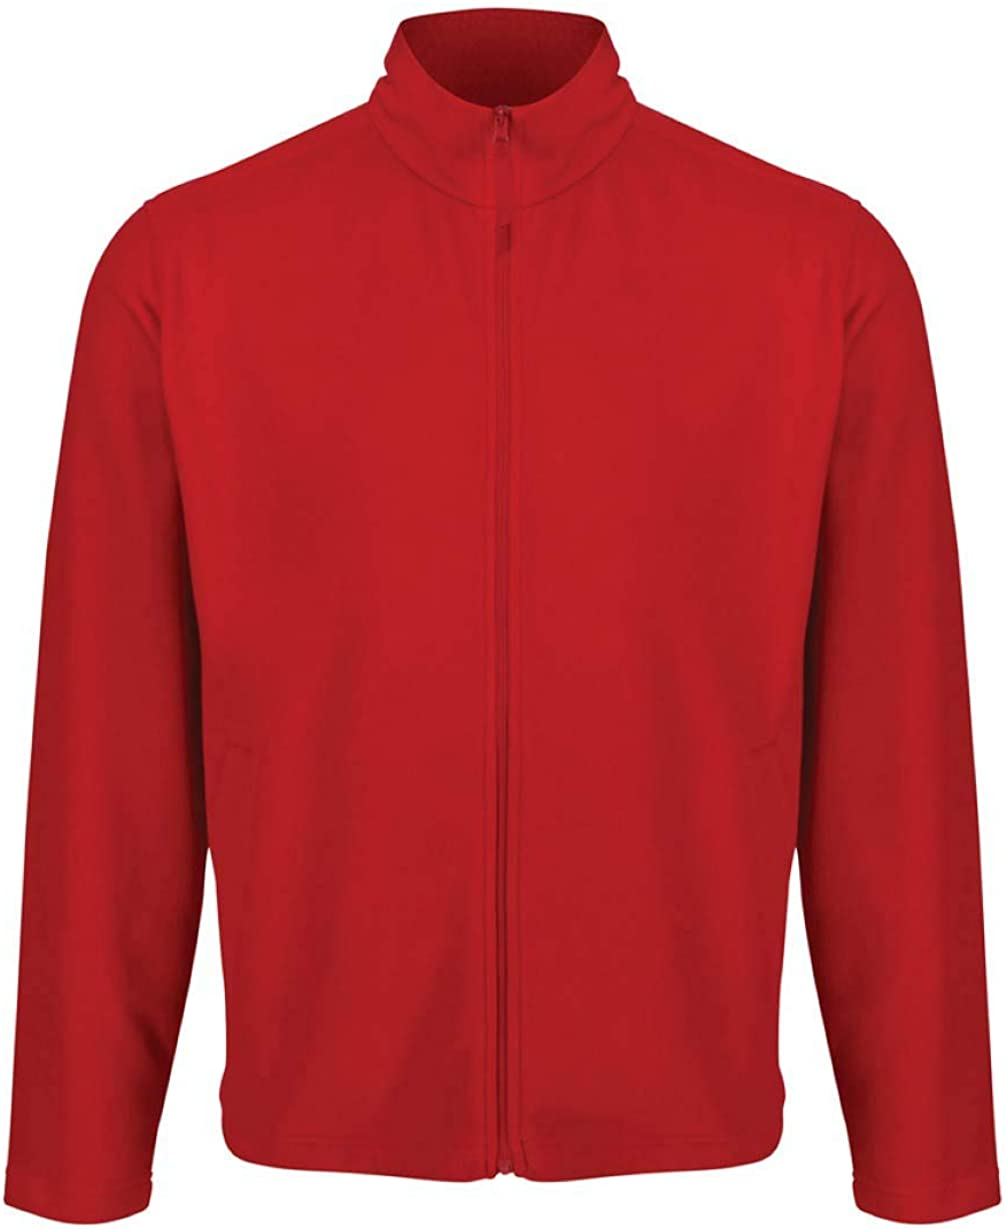 Regatta Classic Micro Fleece Jacket